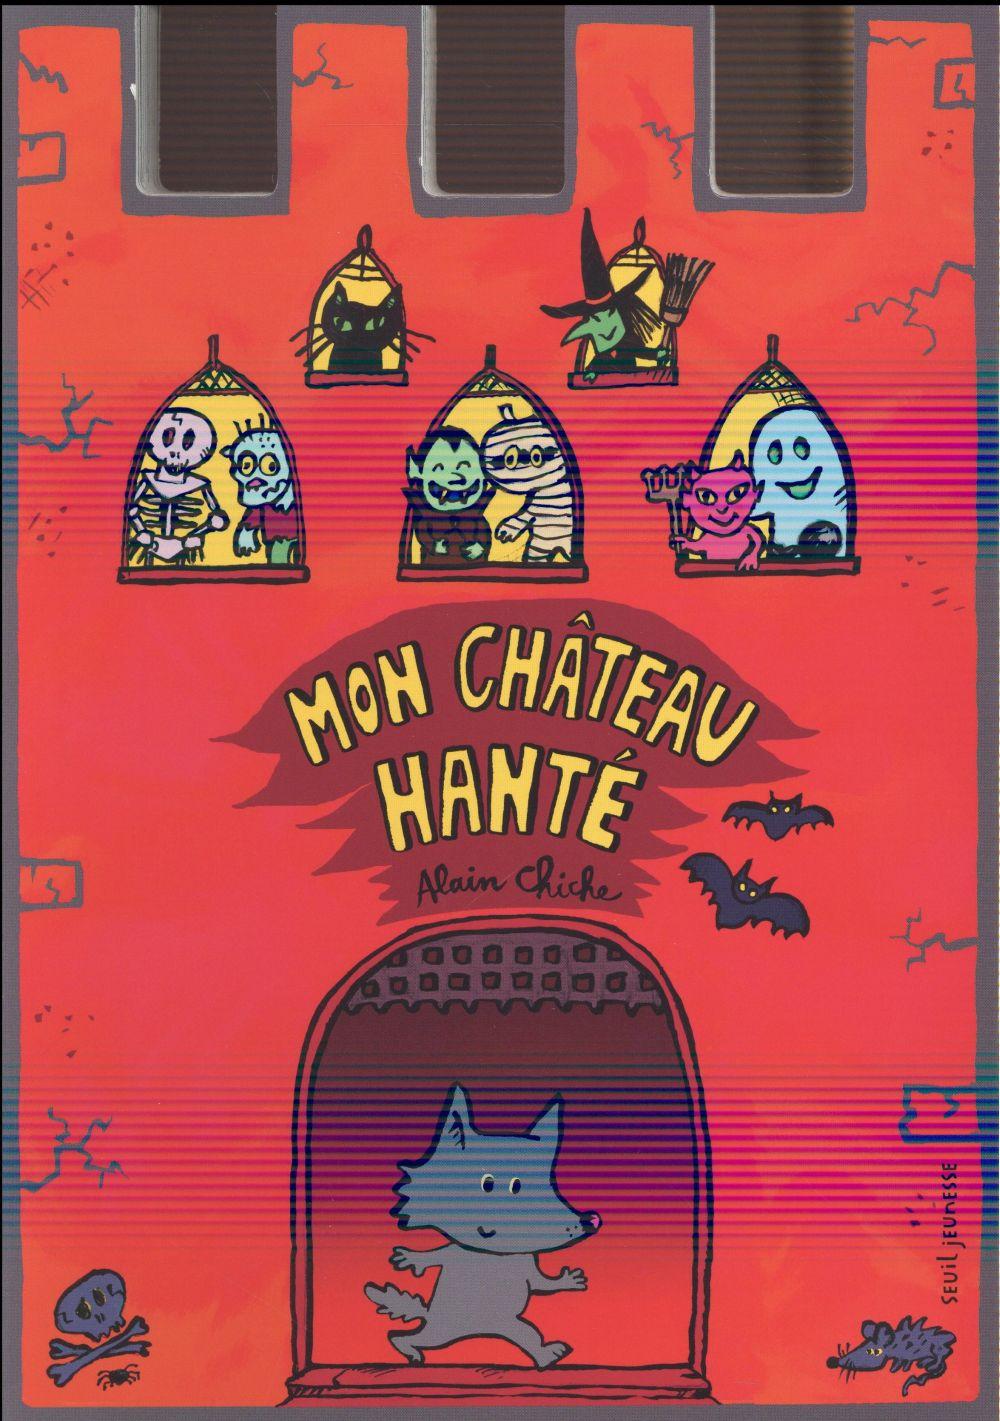 MON CHATEAU HANTE